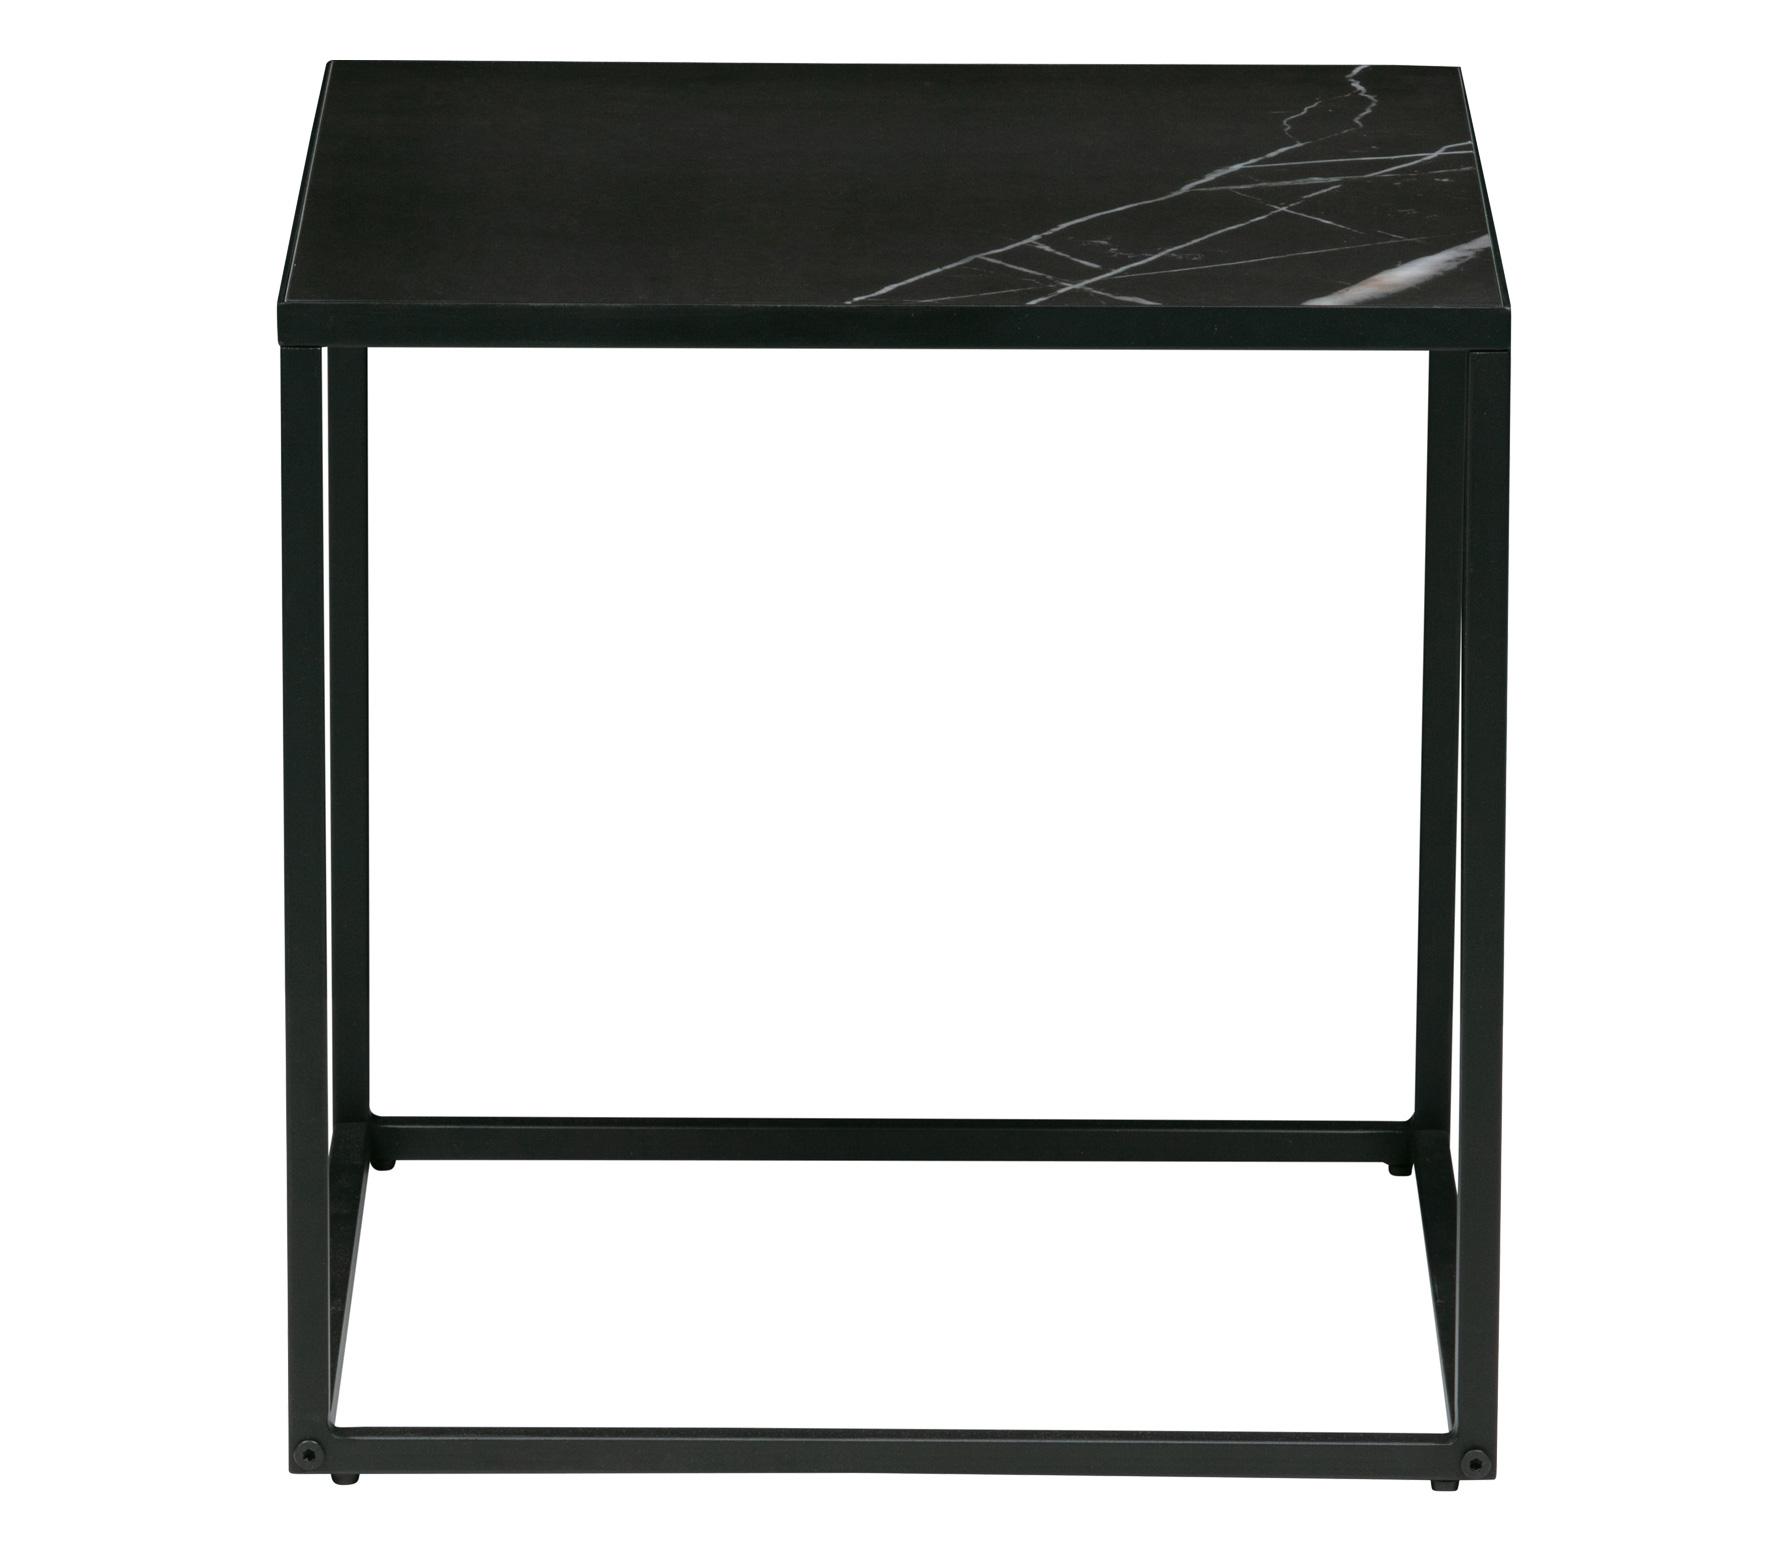 vtwonen Side bijzettafel M marmer look 45x45 cm zwart